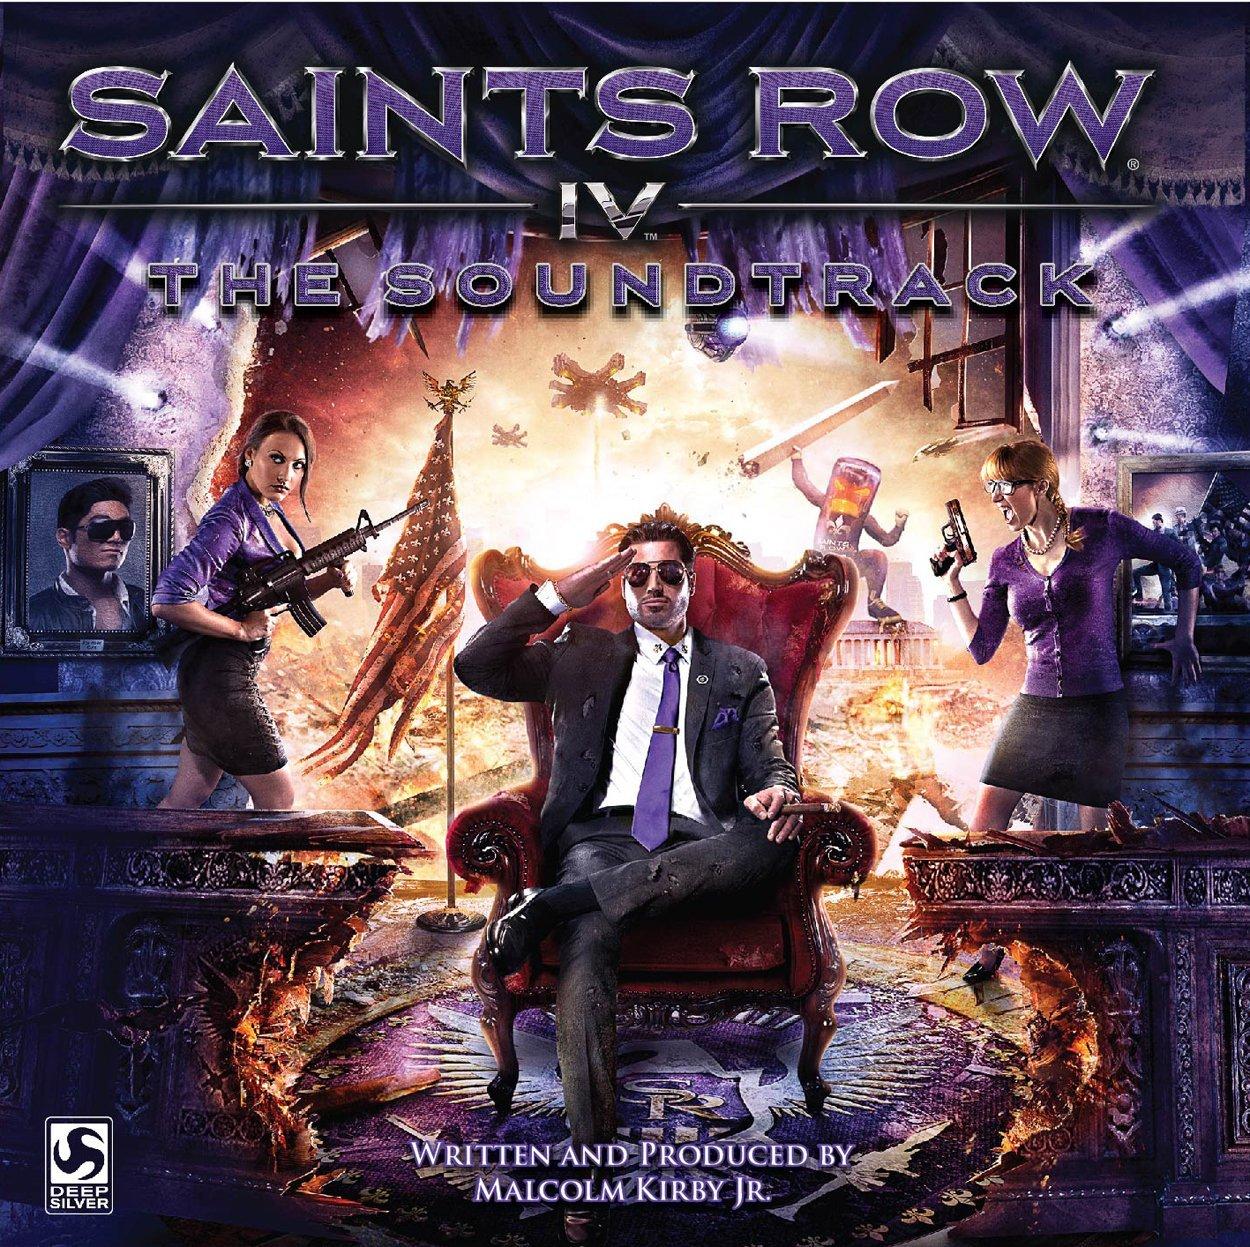 SAINTS ROW IV THE SOUNDTRACK